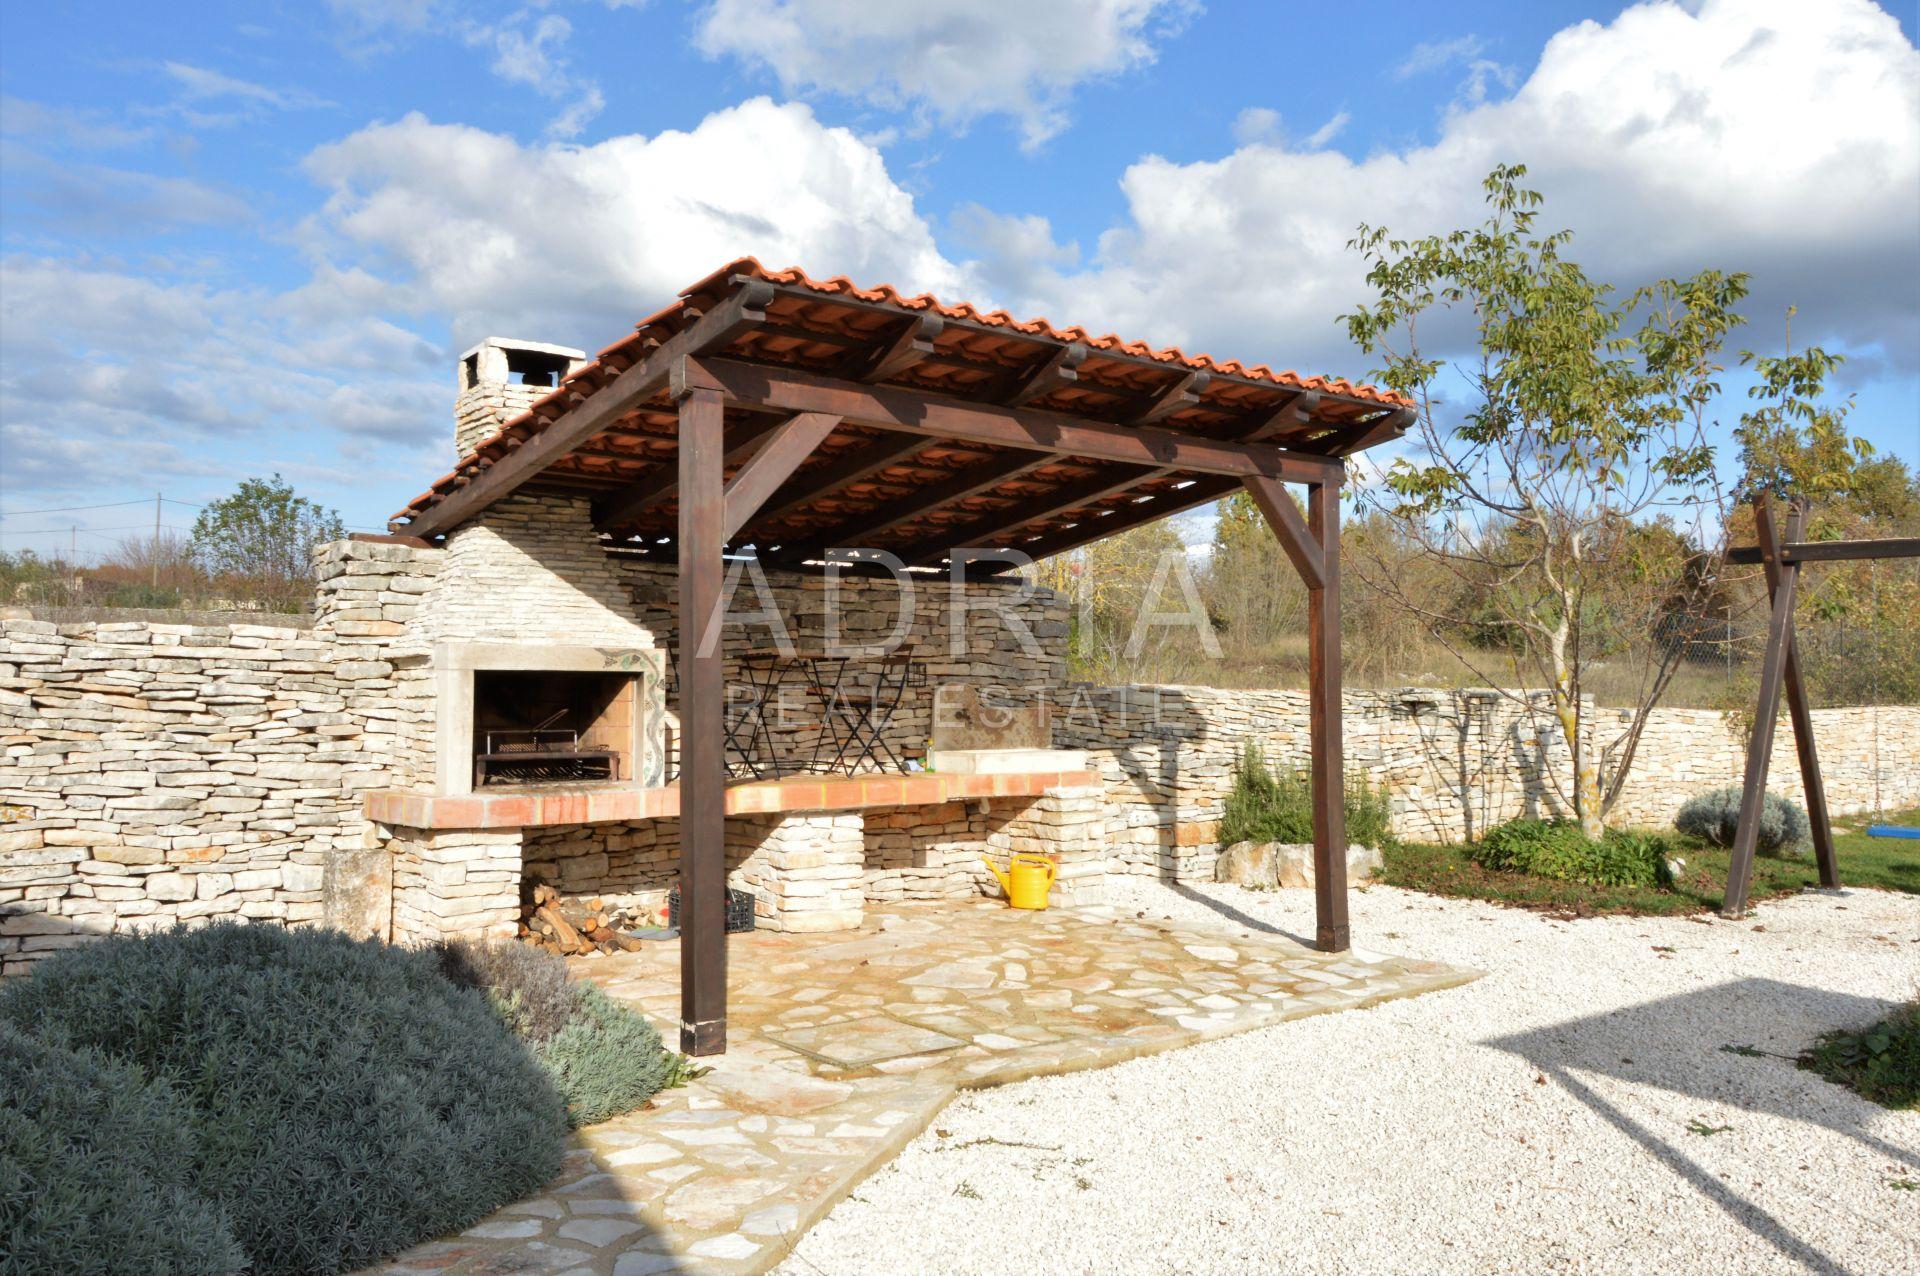 ISTRA: Villa s bazenom